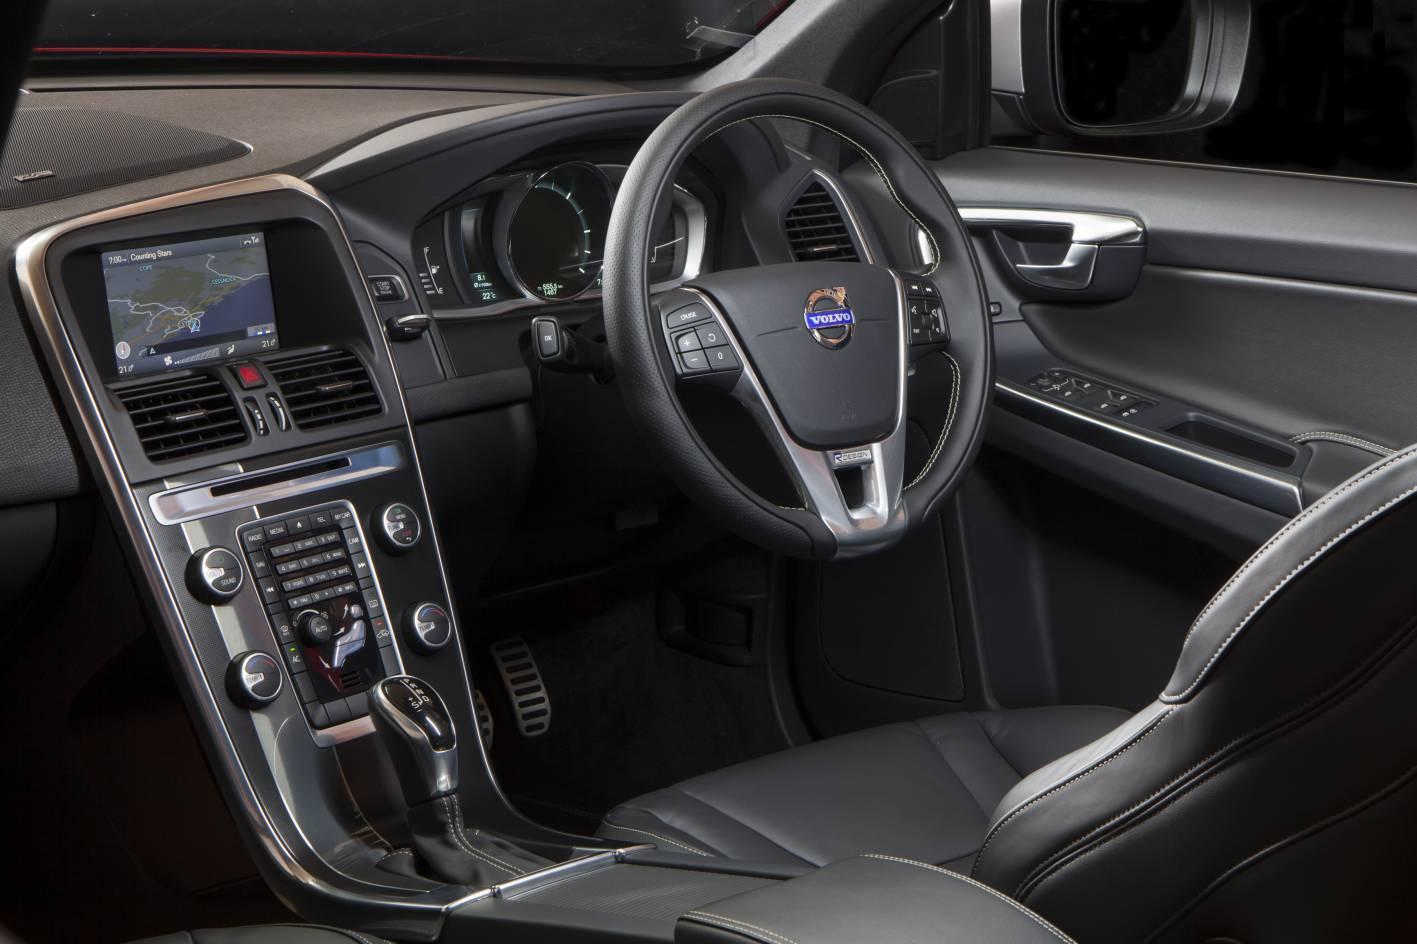 2013 Volvo Xc60 Now On Sale In Australia From 58 990 Performancedrive